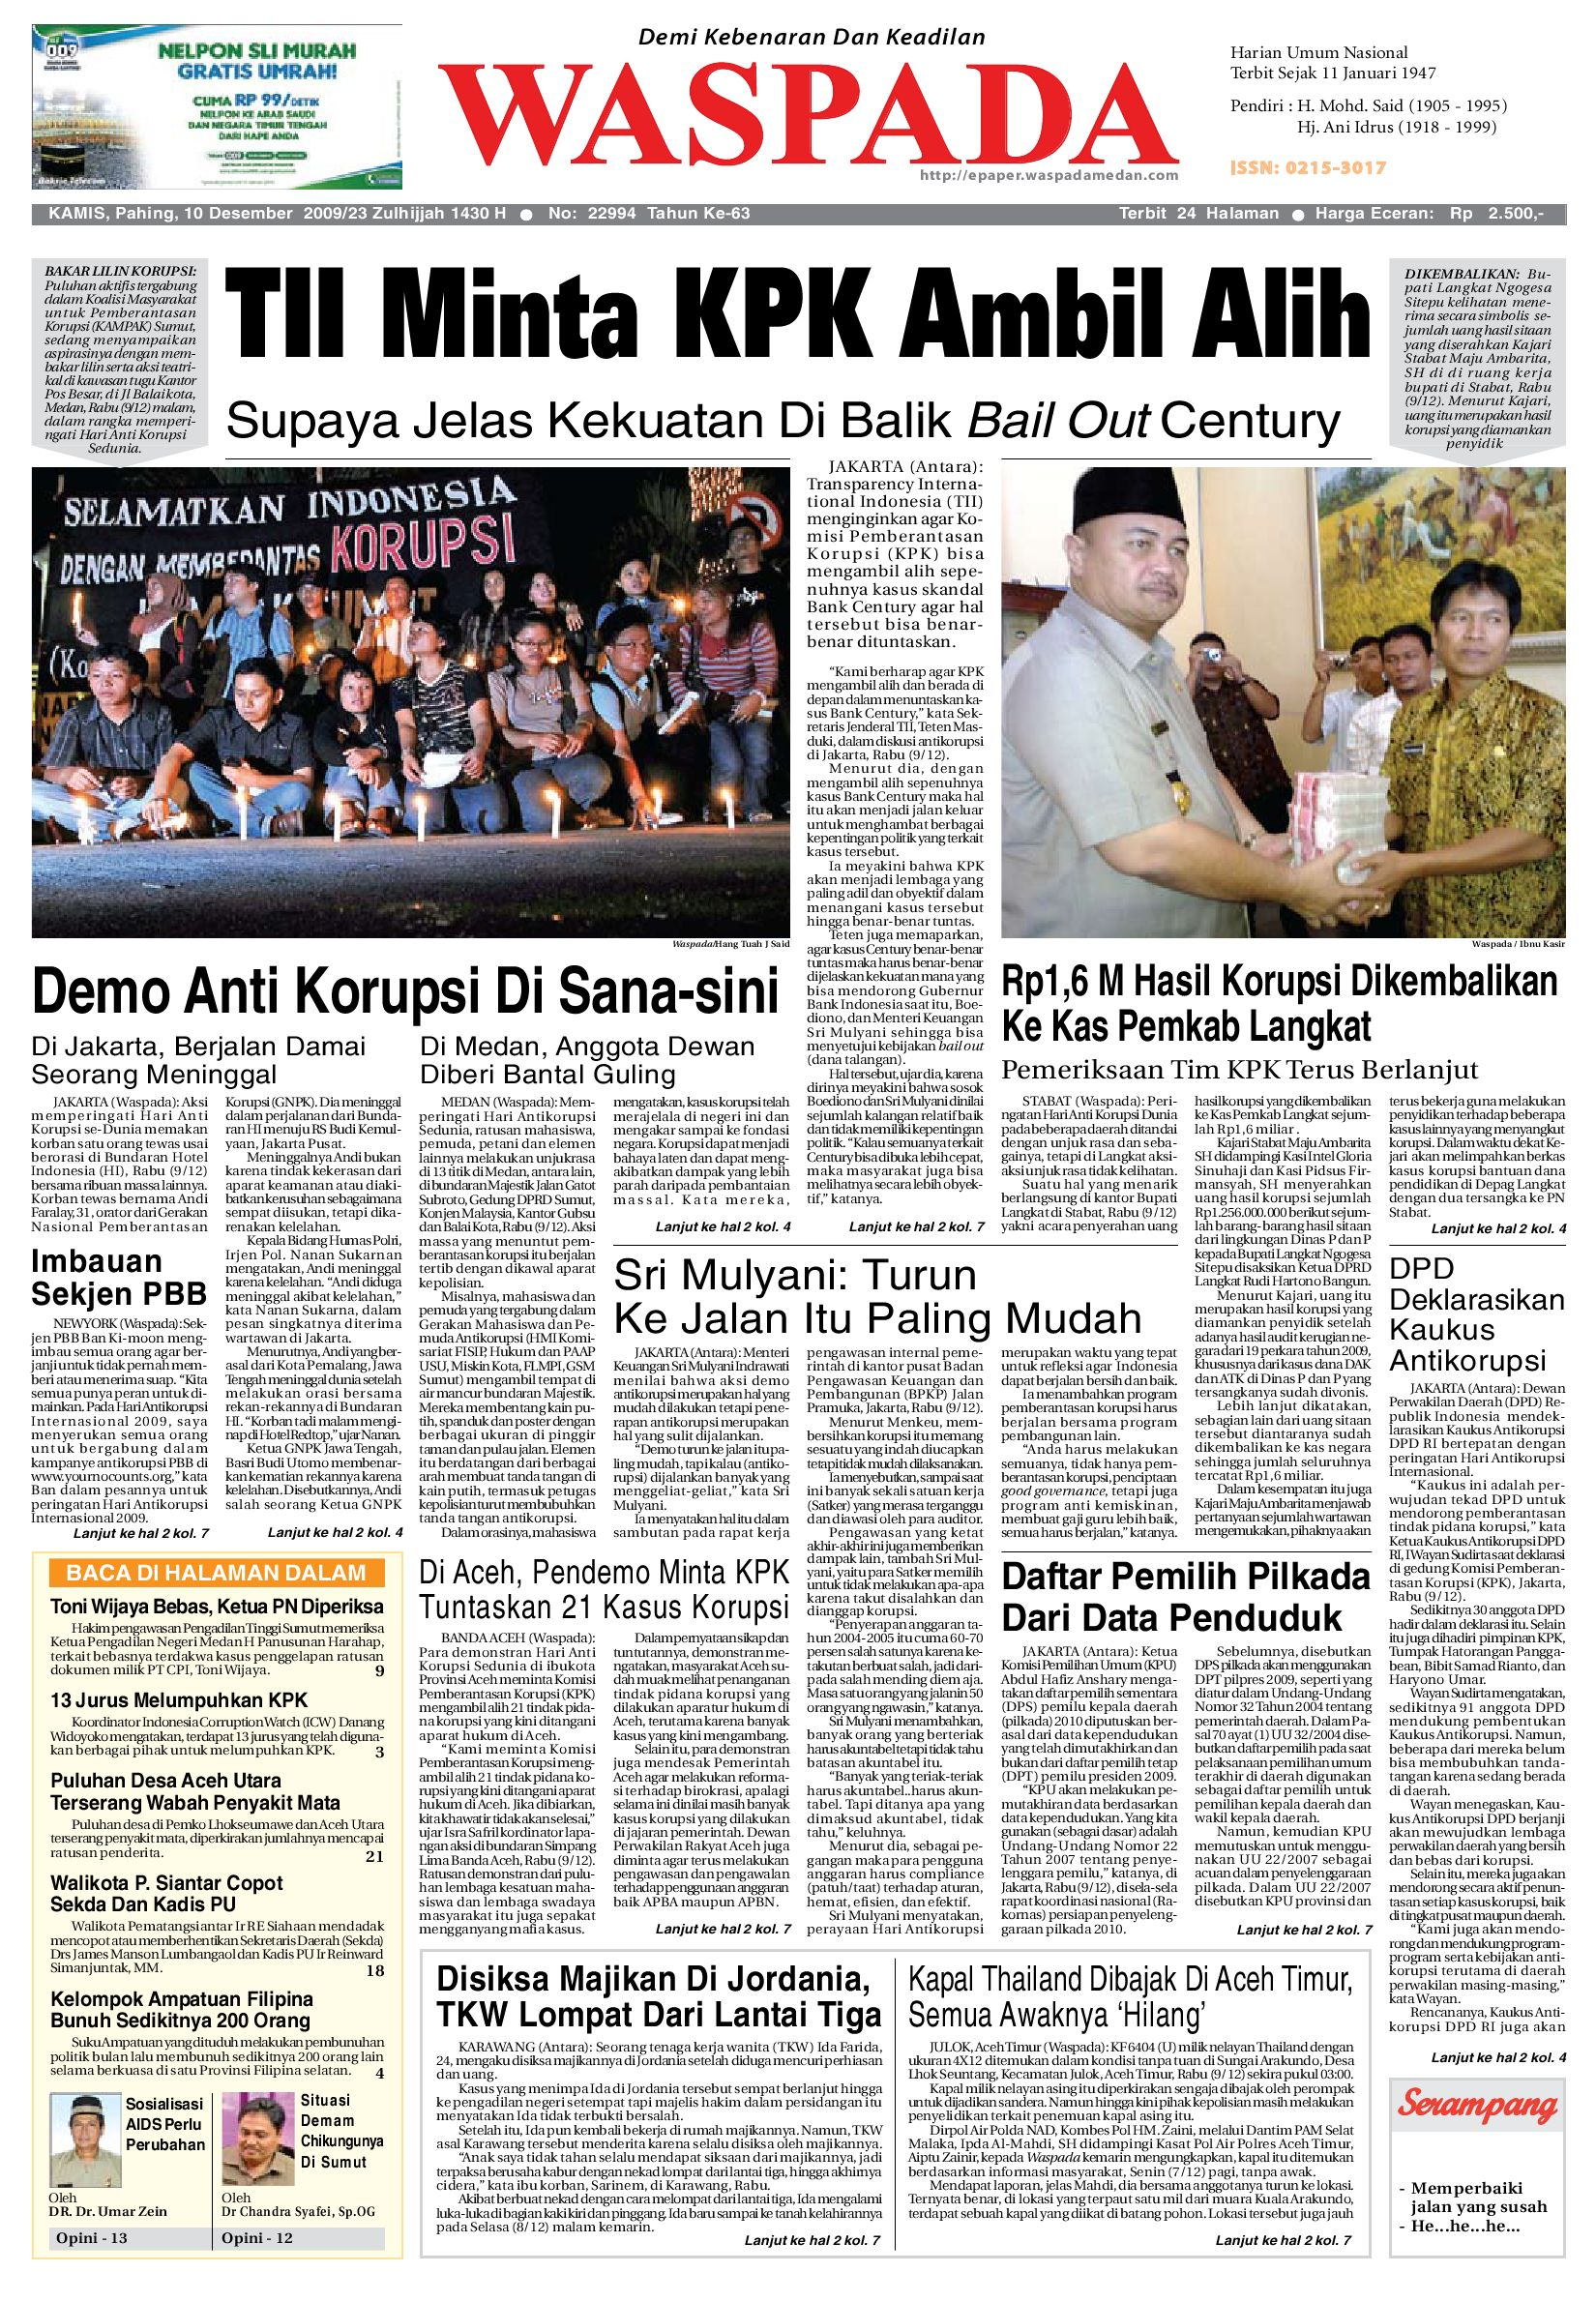 Waspada Kamis 10 Desember 2009 by Harian Waspada - issuu cc3dbe03ca